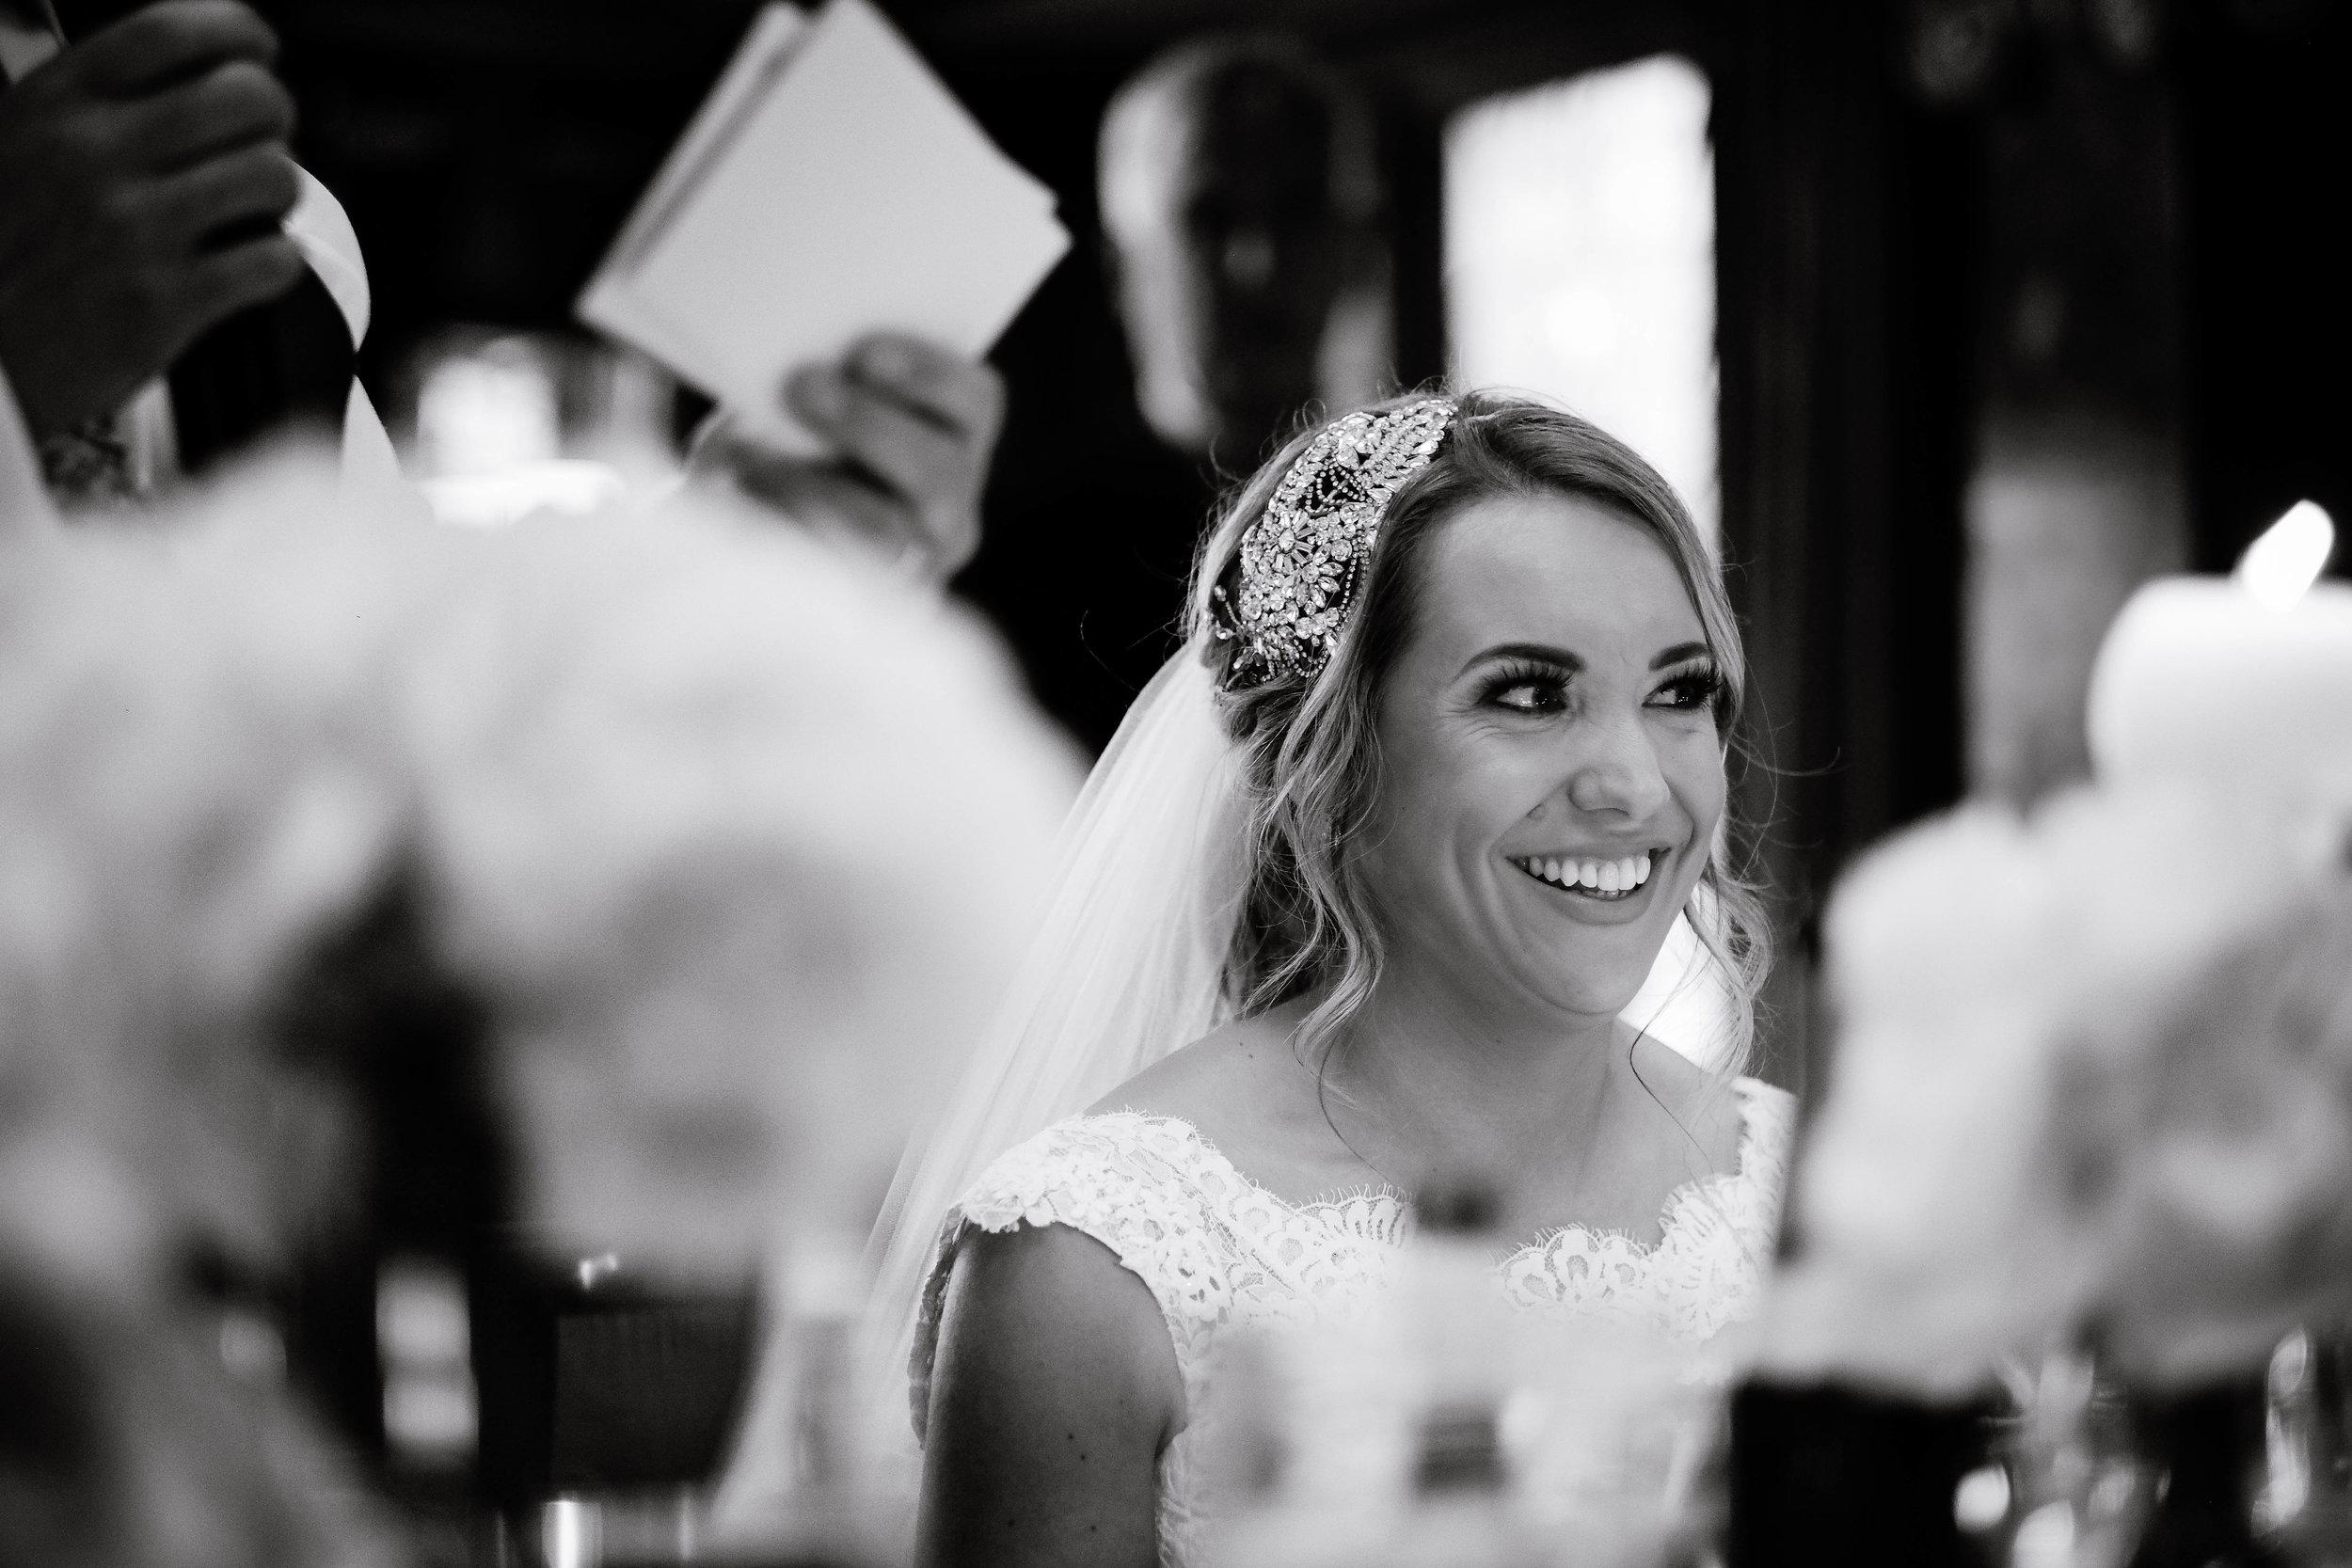 Thornton manor wedding photography cheshire wedding photographer liverpool manchester warrington chester wirral wedding BLOG (66 of 108).jpg